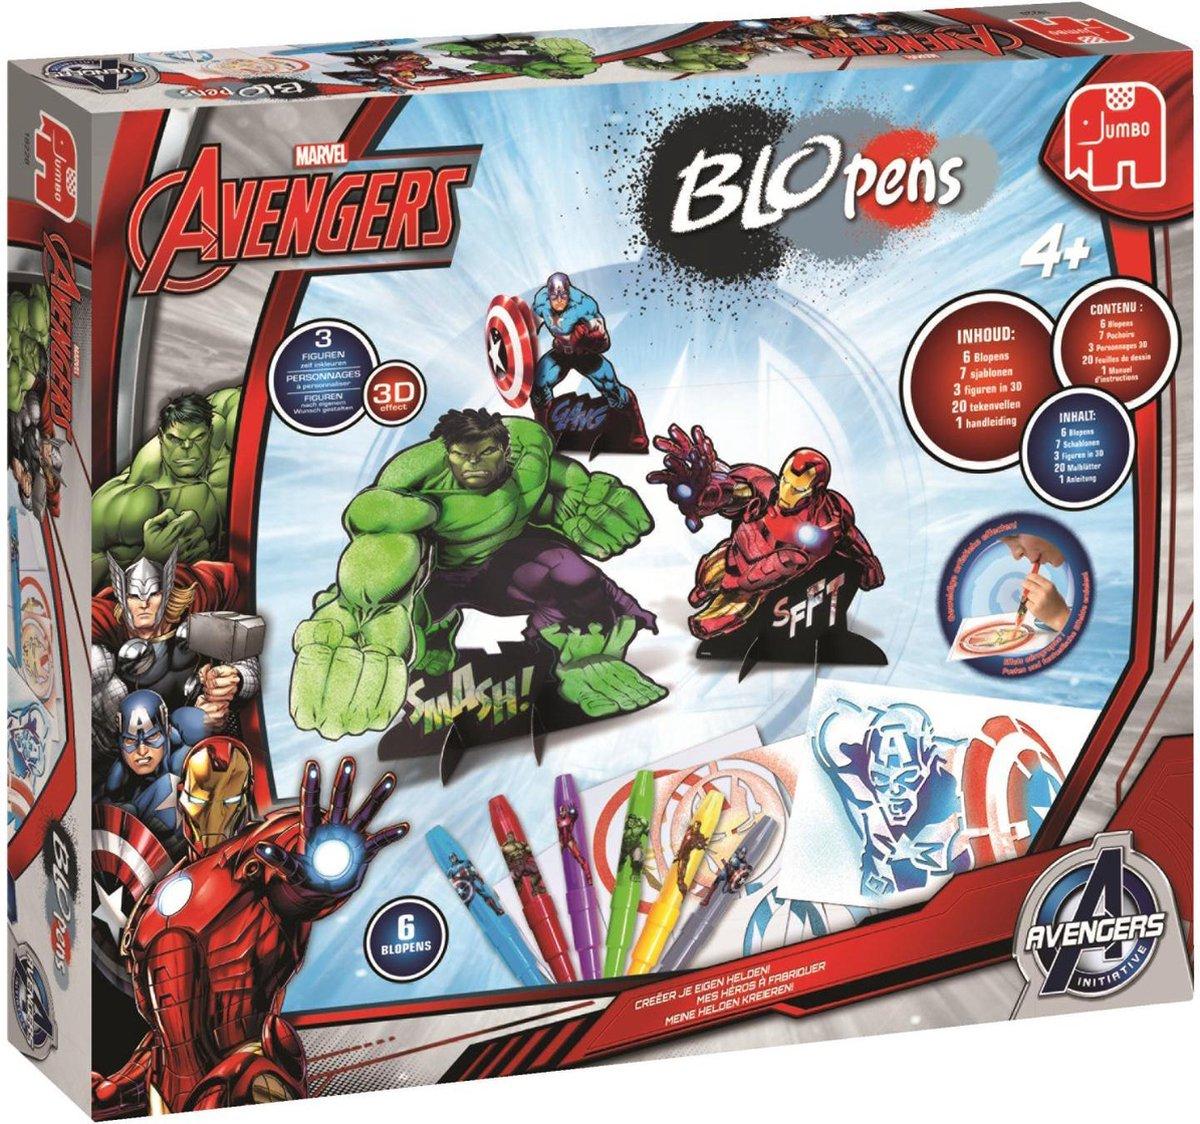 Blopens Avengers Workshop